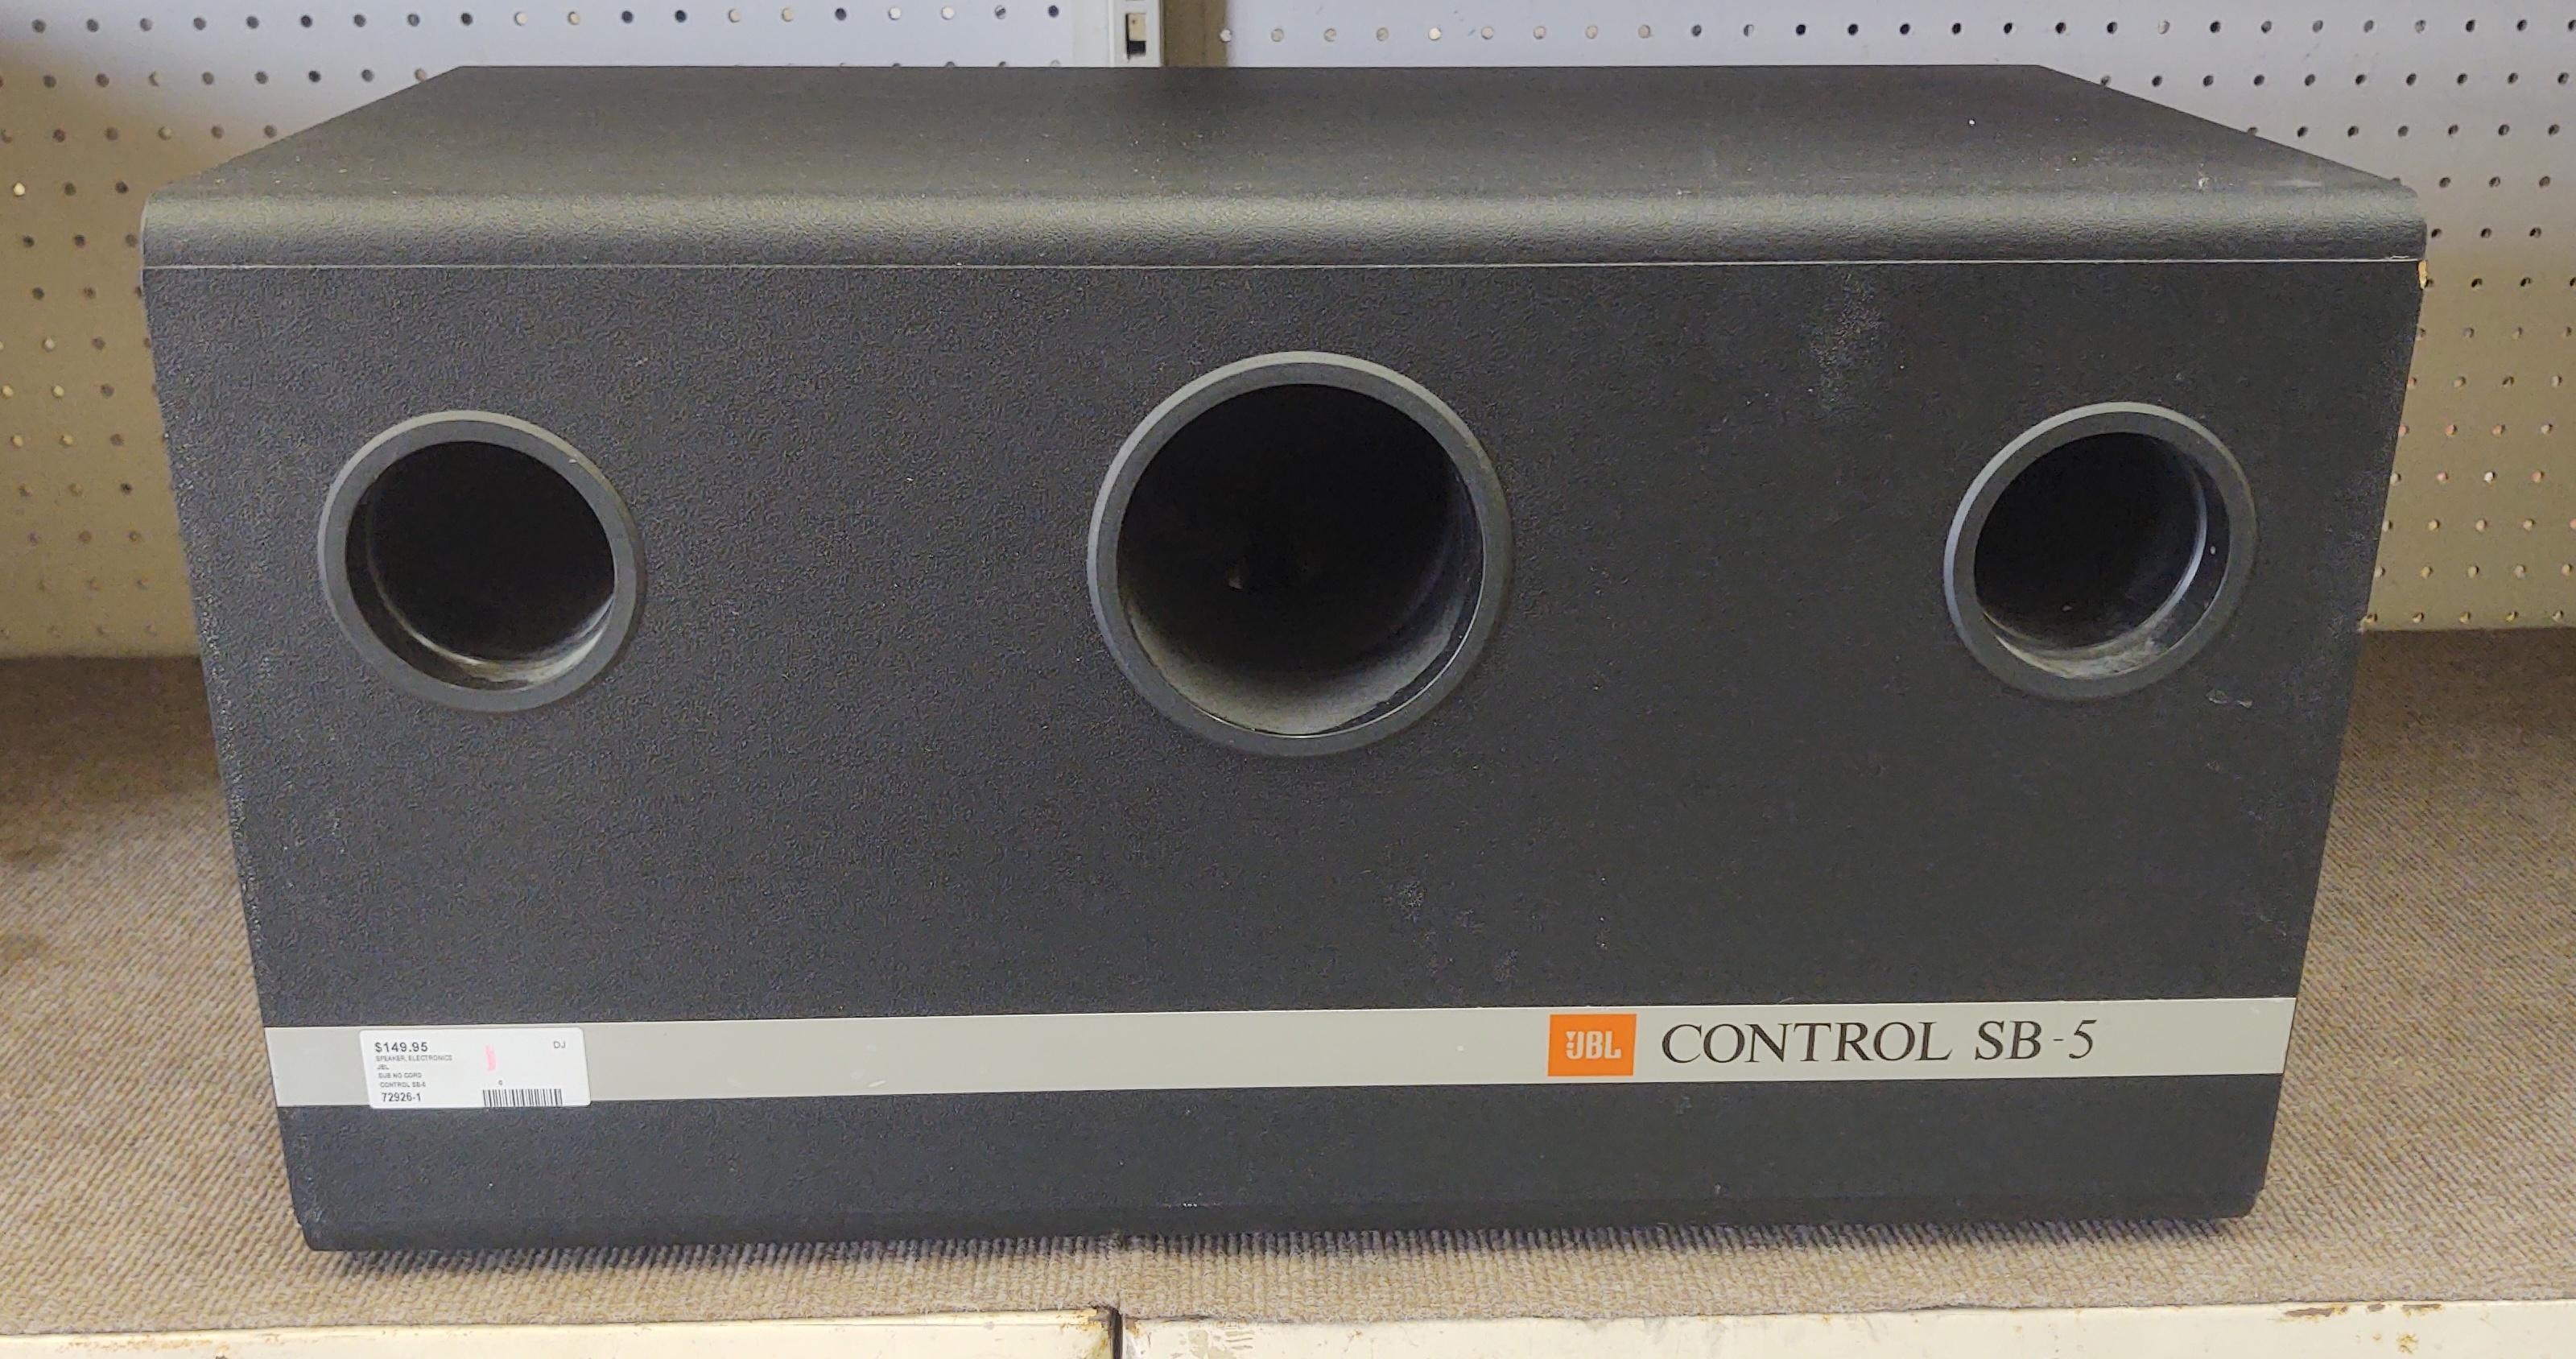 JBL - CONTROL SB-5 - SPEAKER ELECTRONICS SUB